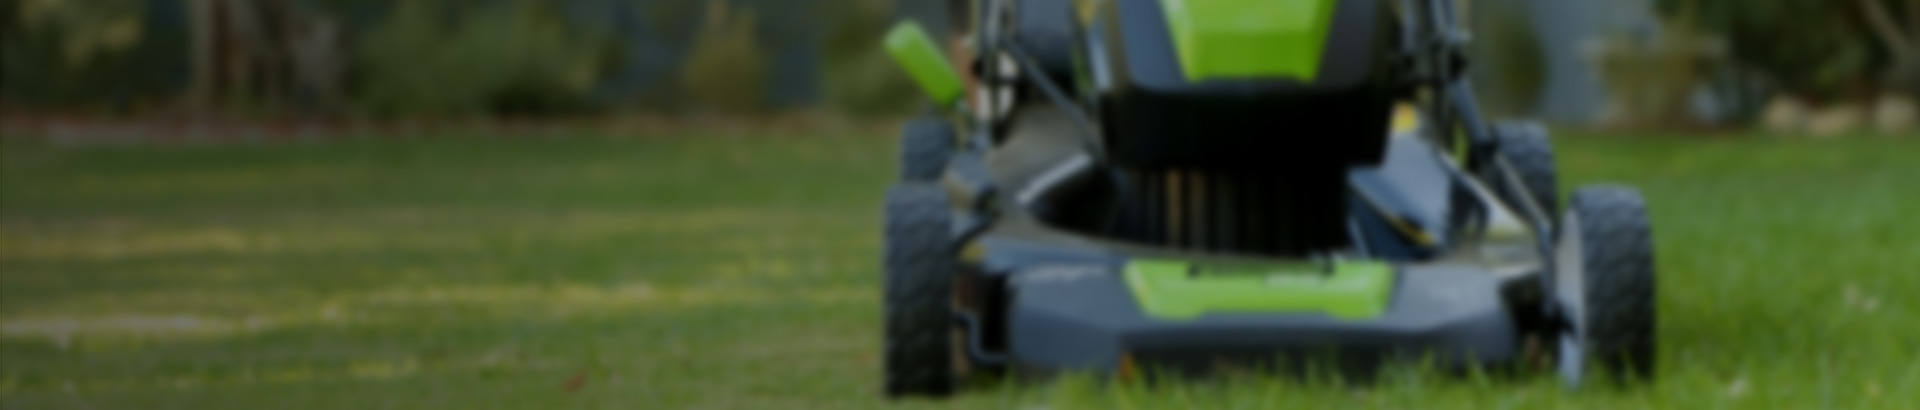 Lawnmower Buying Guide Hero Image